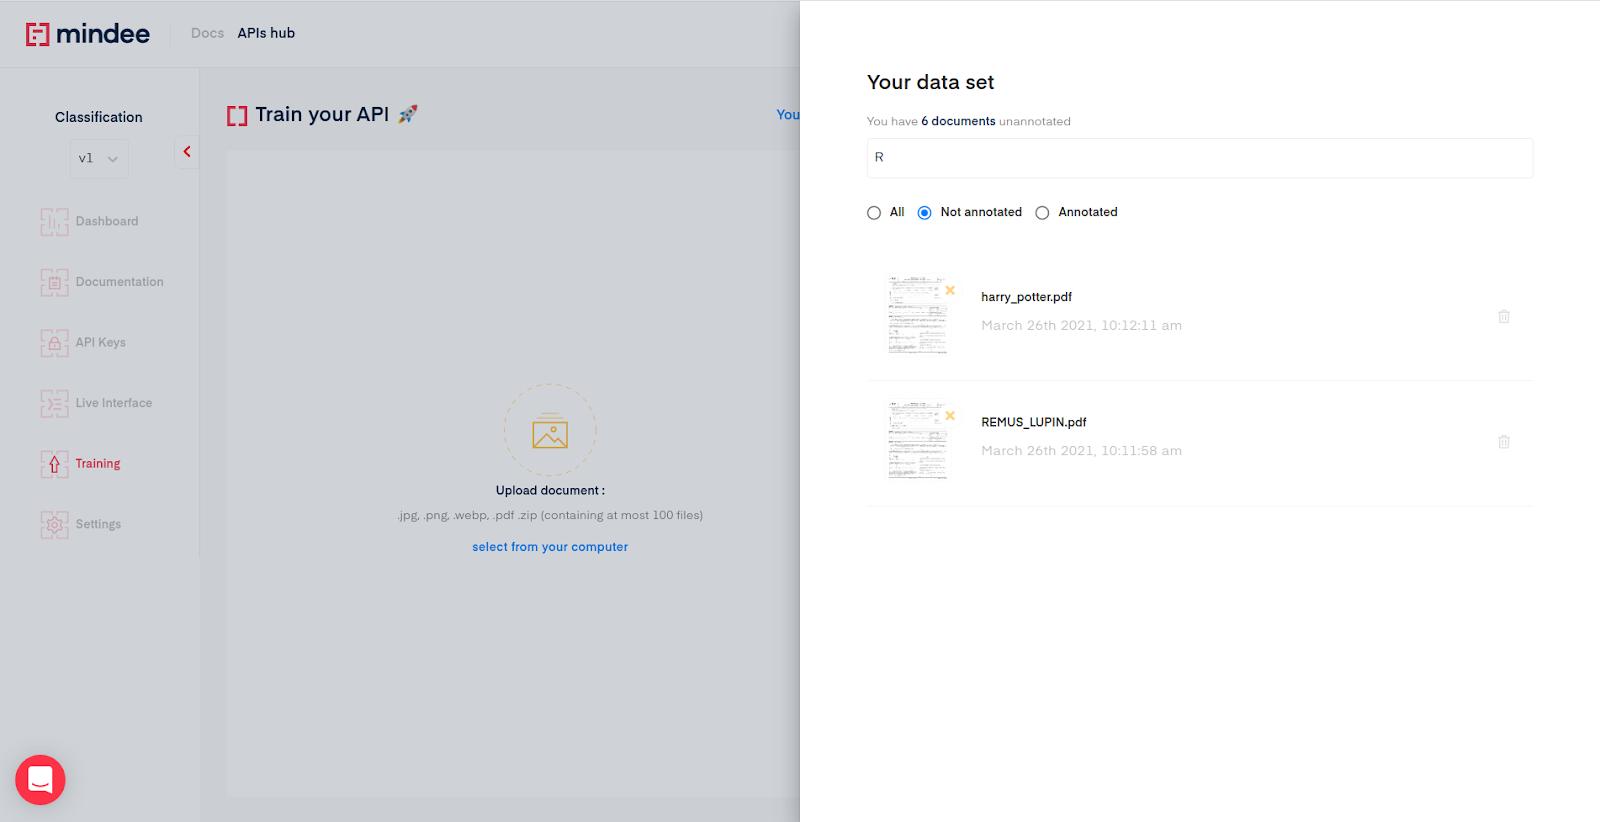 Document classifier data management pane